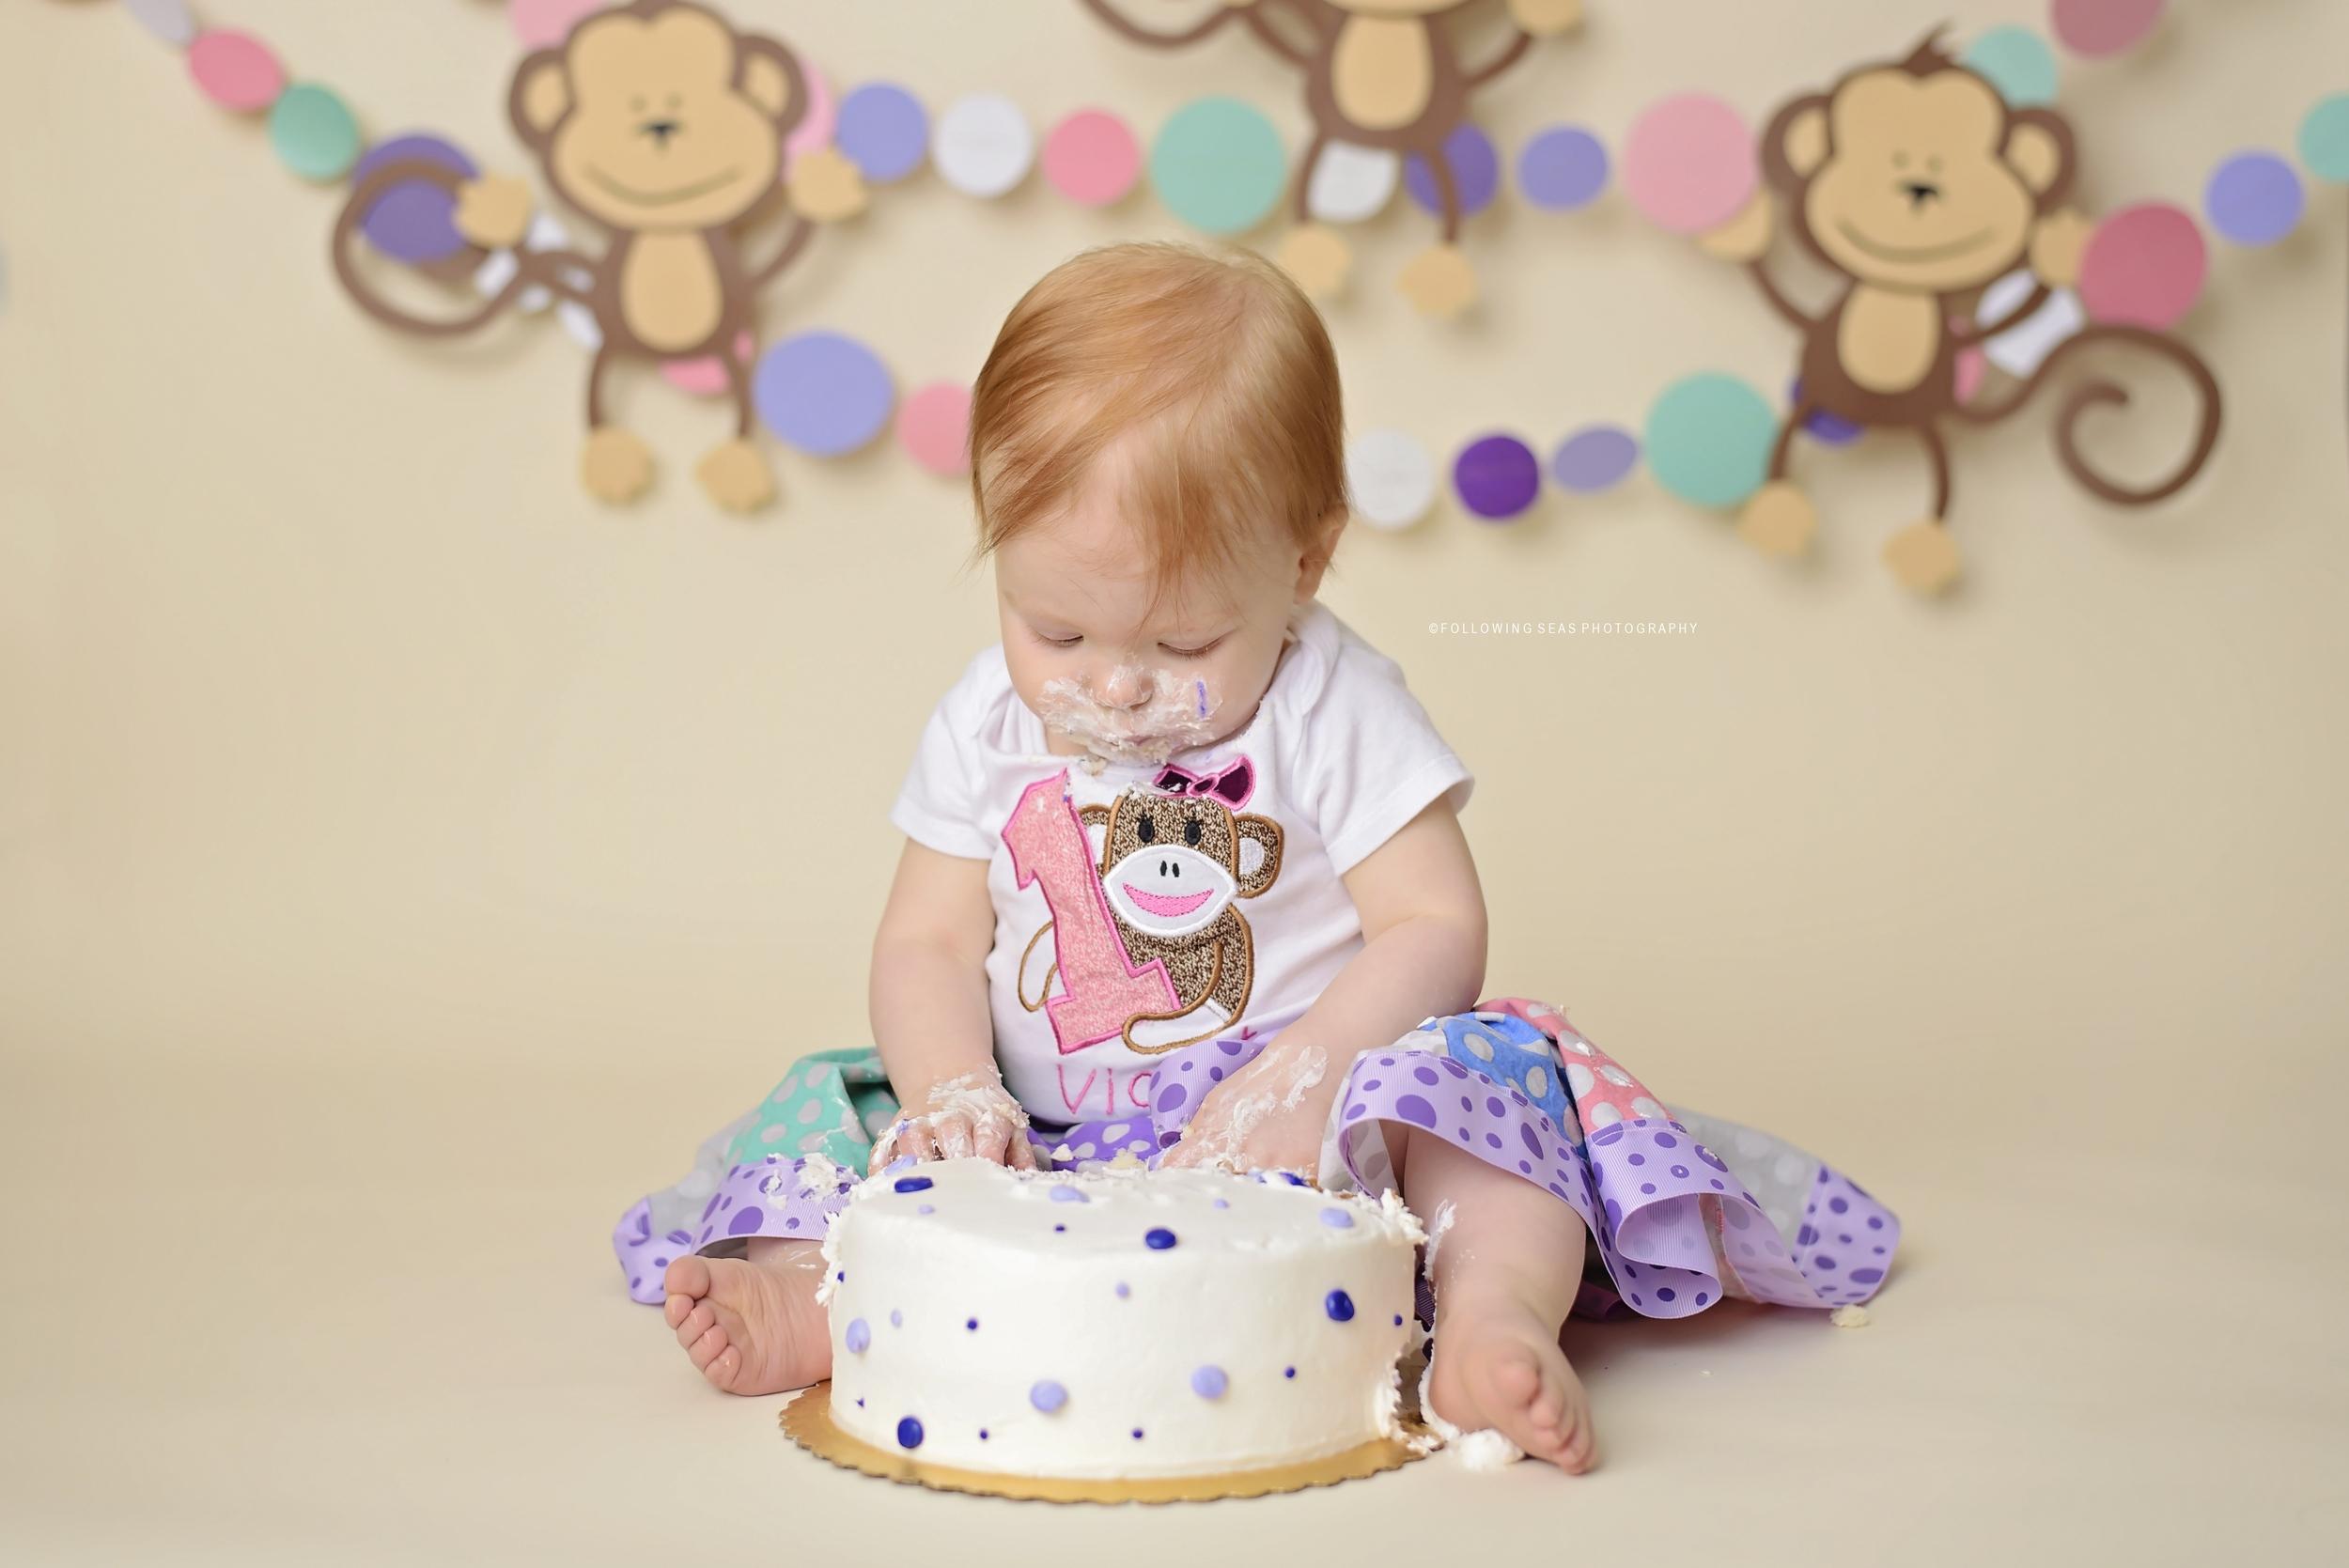 Bremerton Cake Smash Photographer-5125 copy.jpg